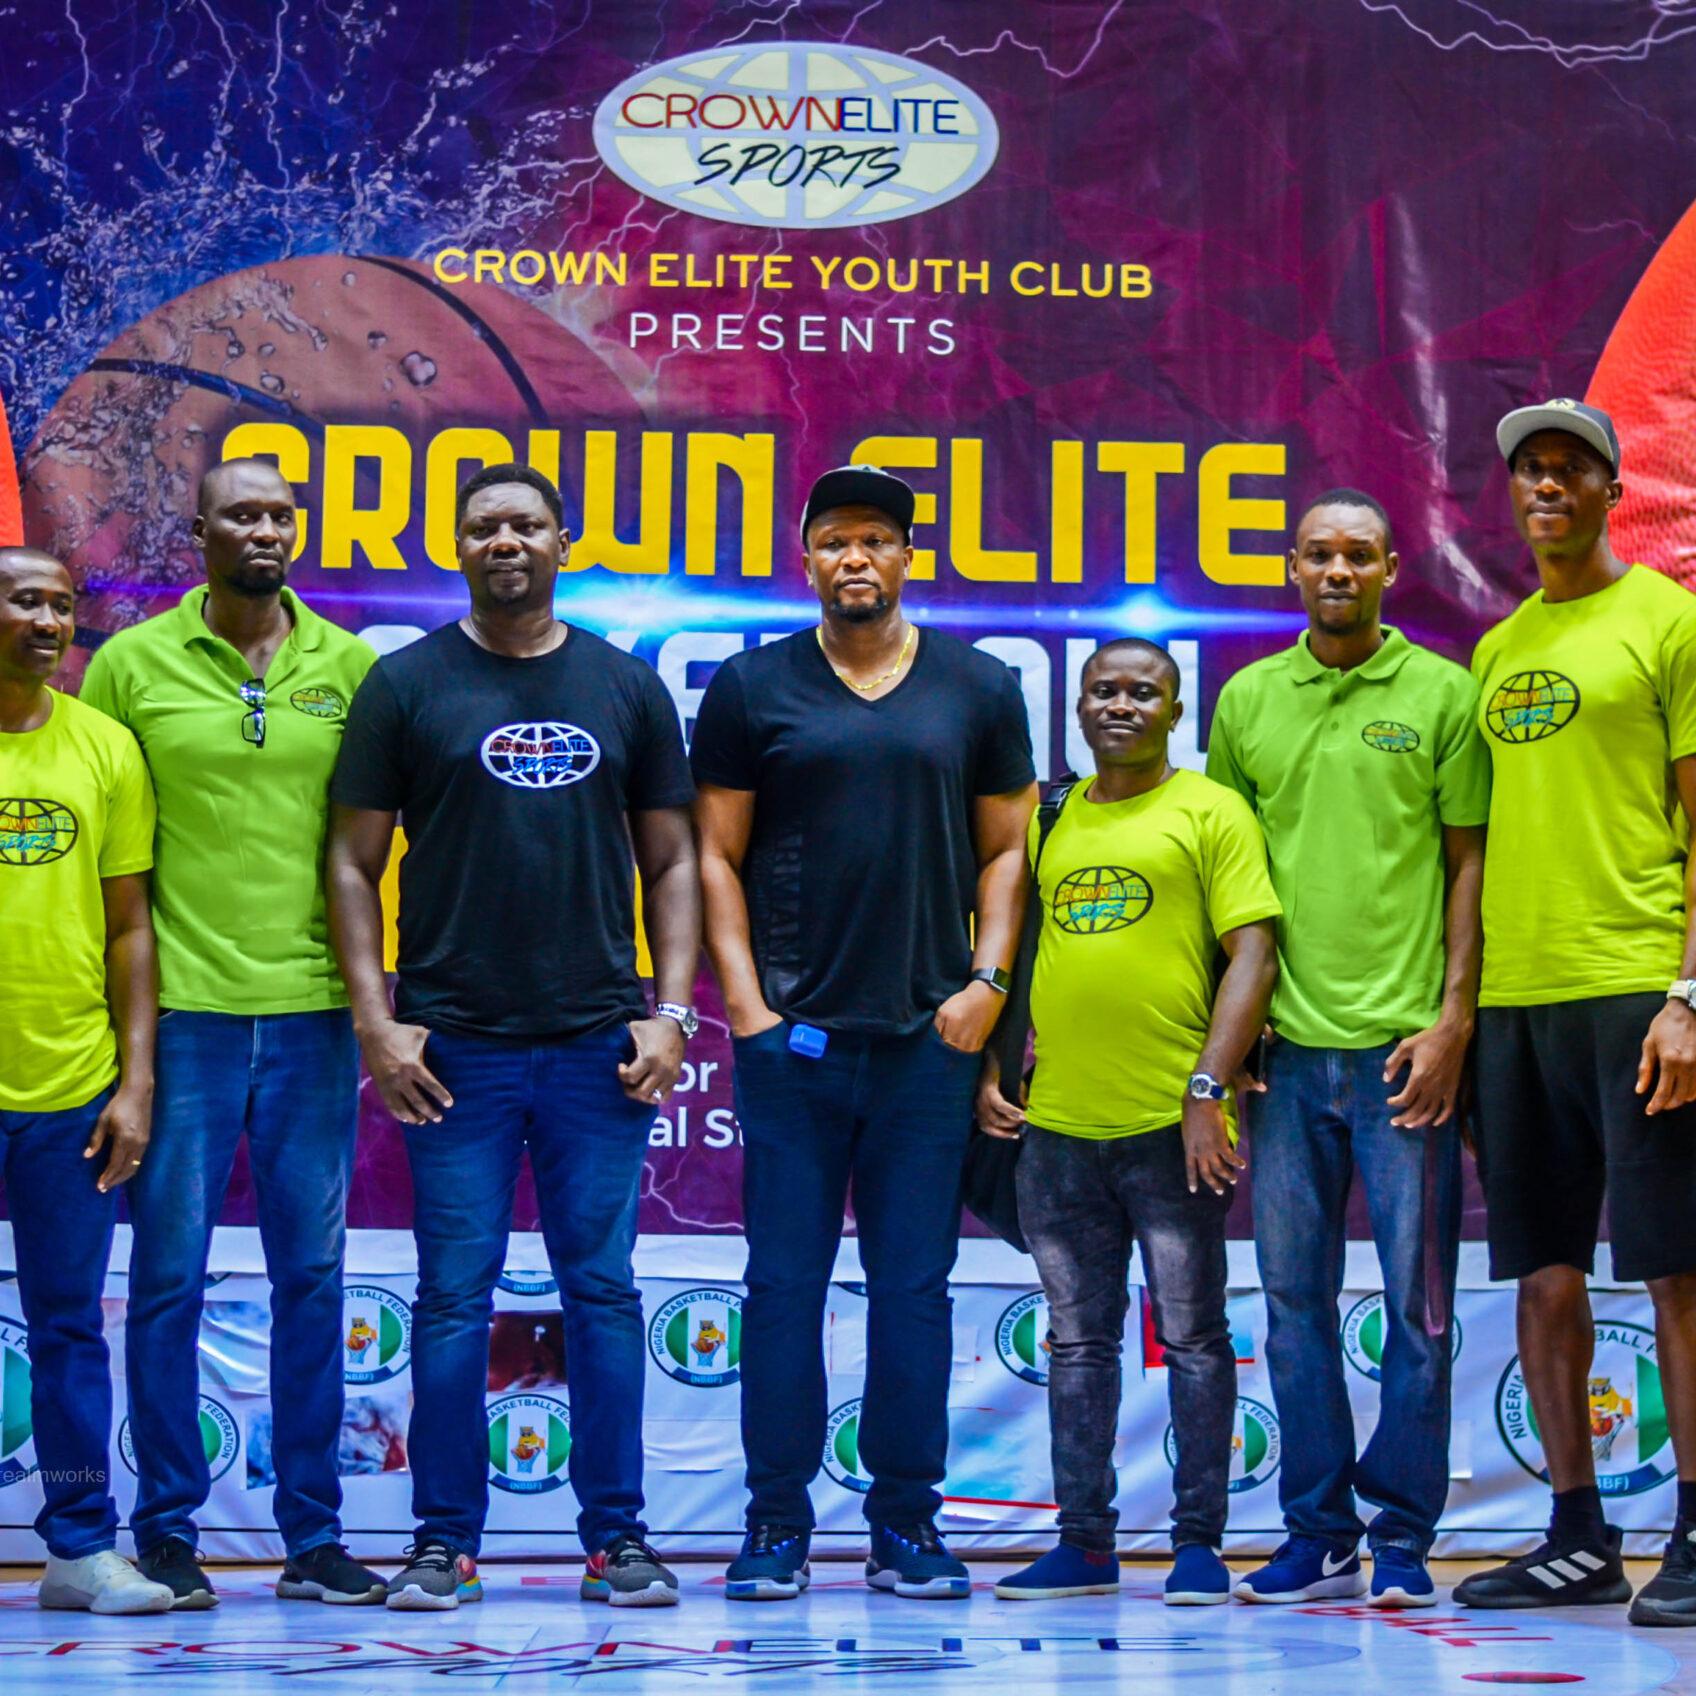 The Crown Elite Sports Team.